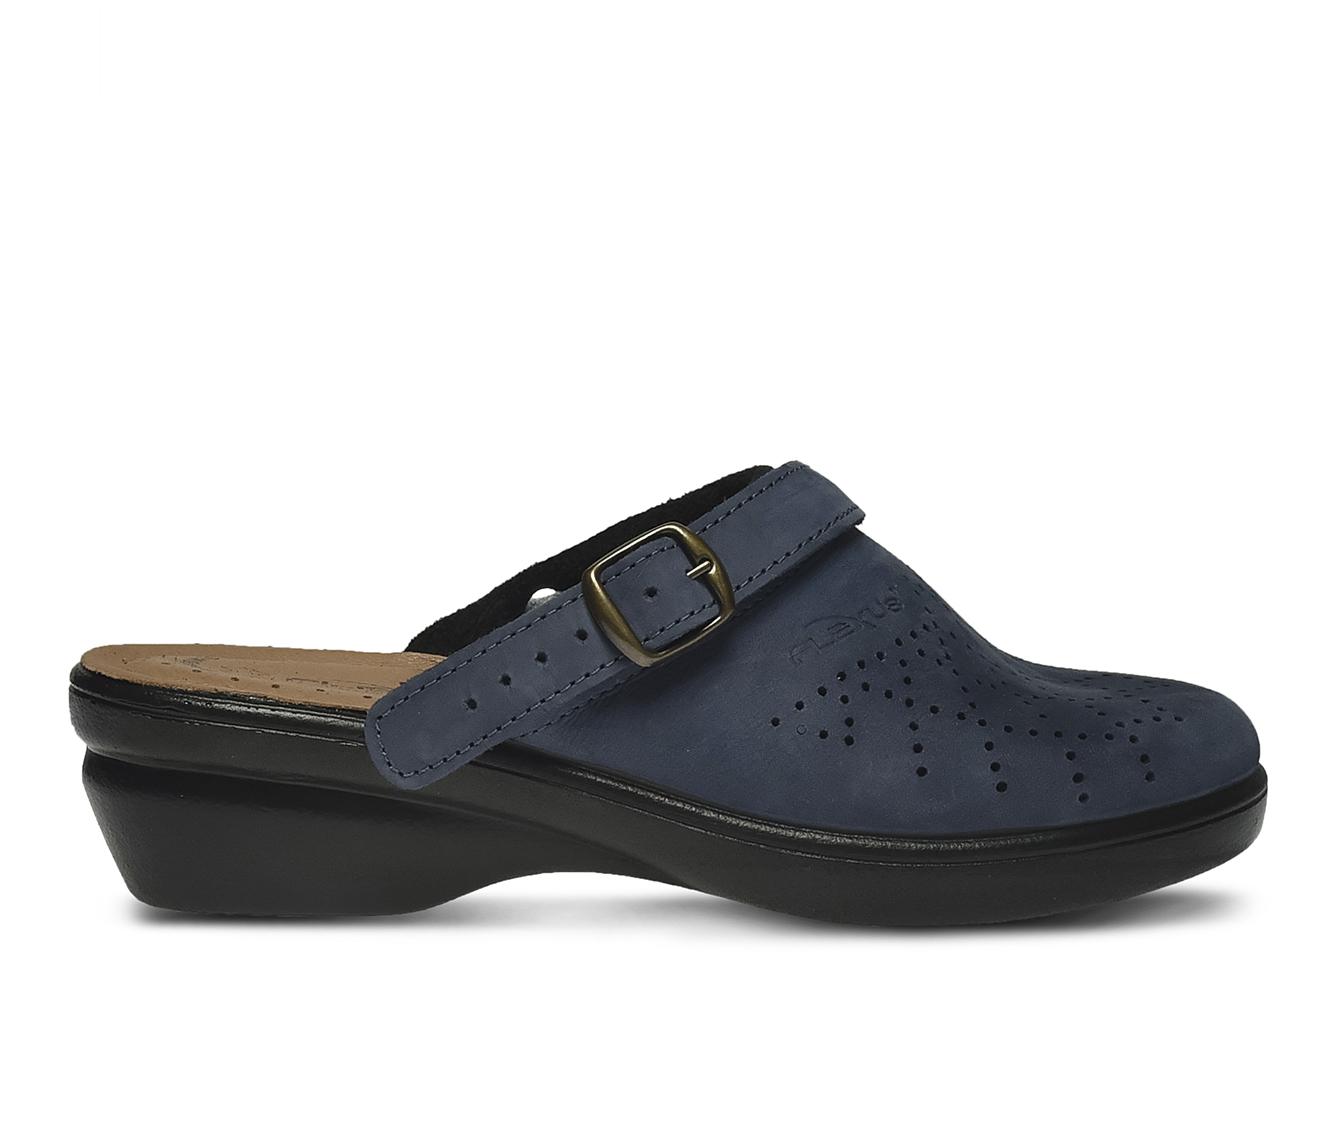 Flexus Pride Women's Shoe (Blue Faux Leather)